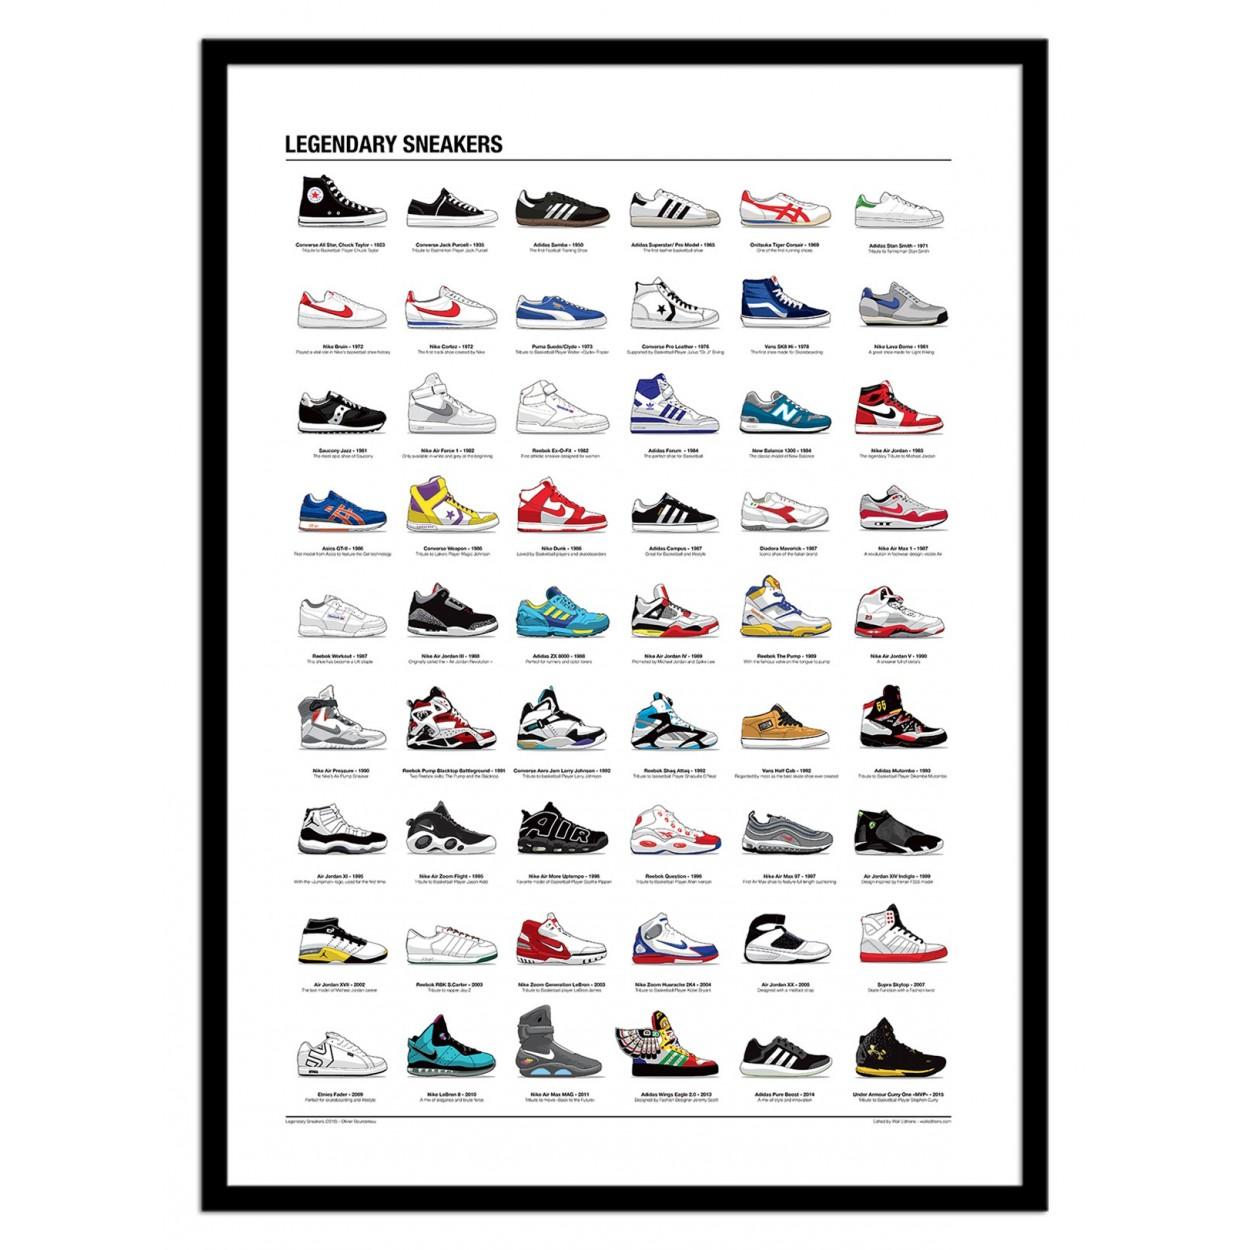 LEGENDARY SNEAKERS -  Affiche d'art 50 x 70 cm